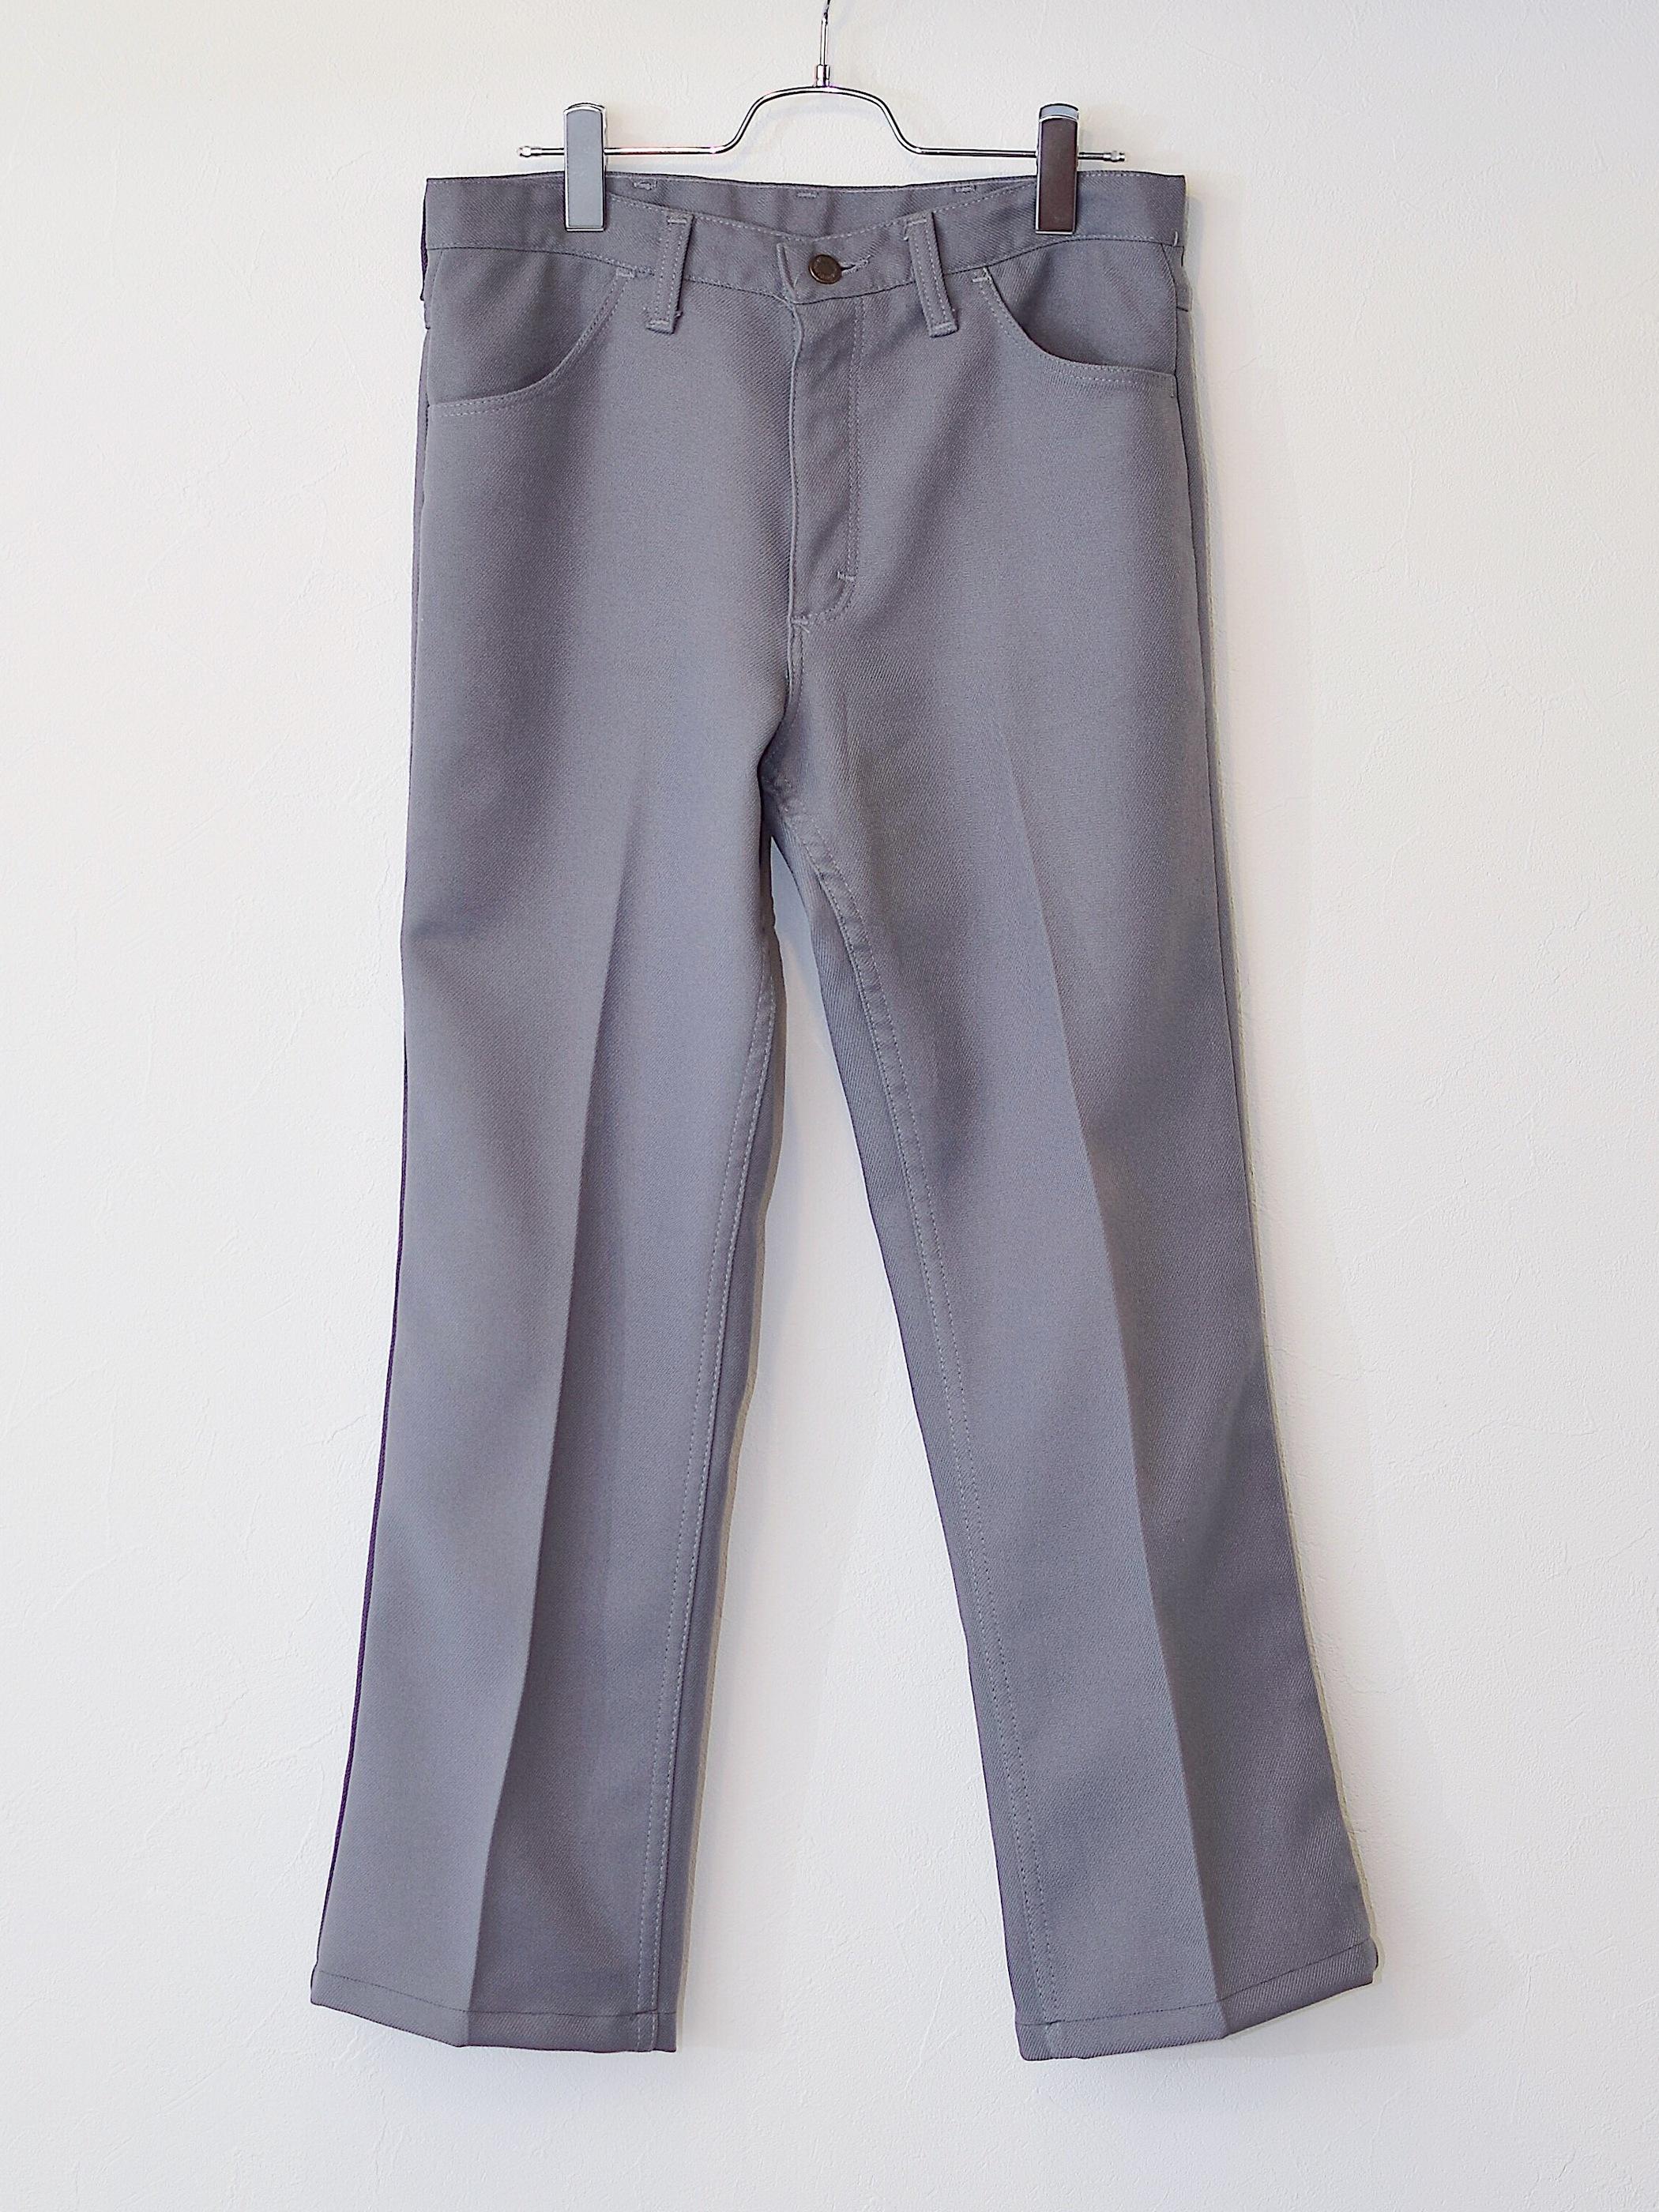 Vintage 【Wrangler】Wrancher Dress Jeans